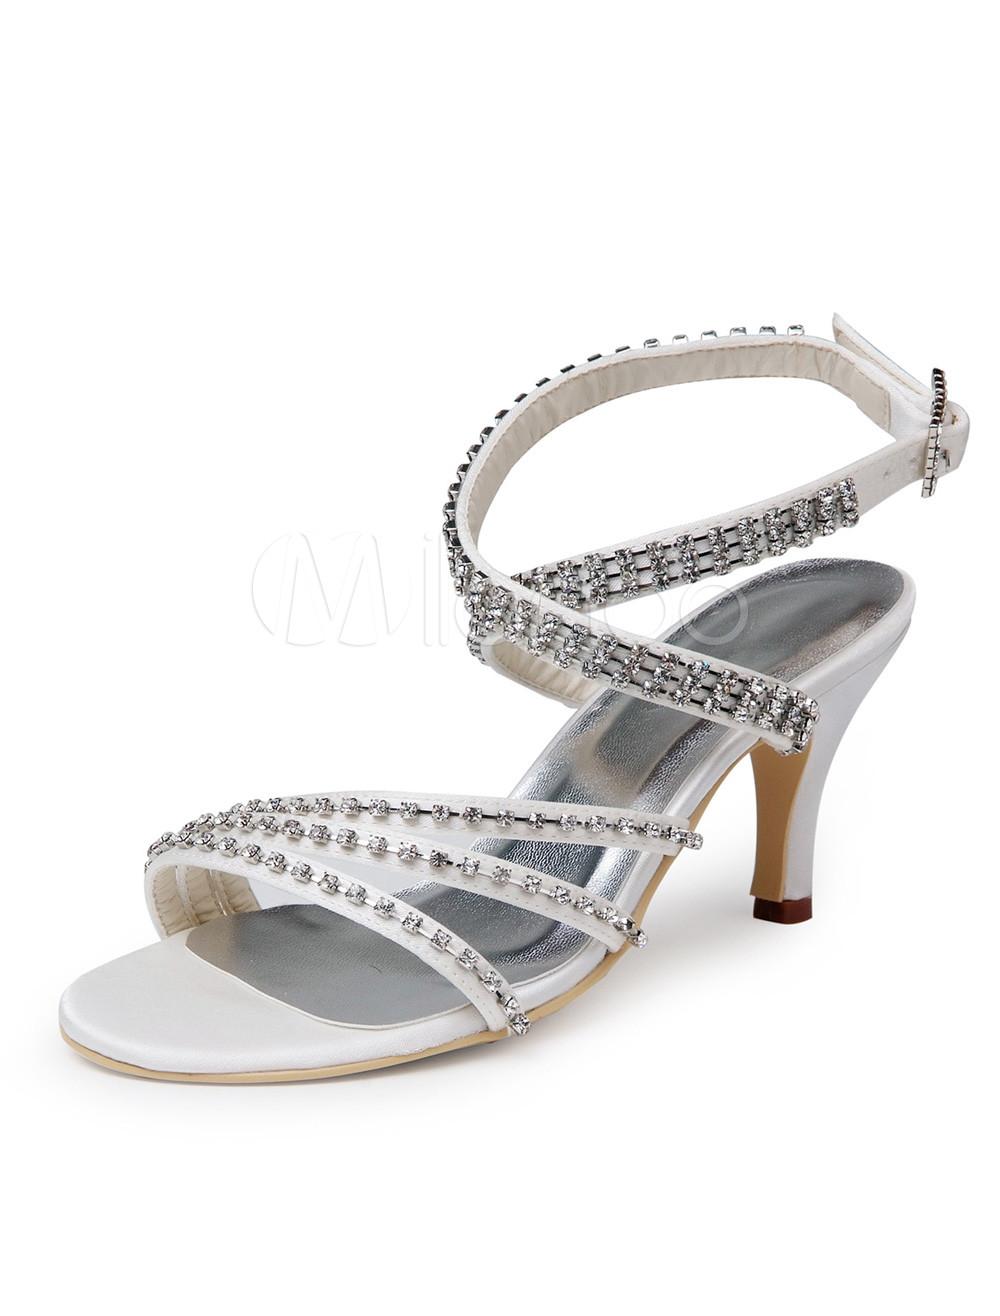 Elegant Ecru White Silk And Satin Rhinestone Peep Toe Shoes for Bride